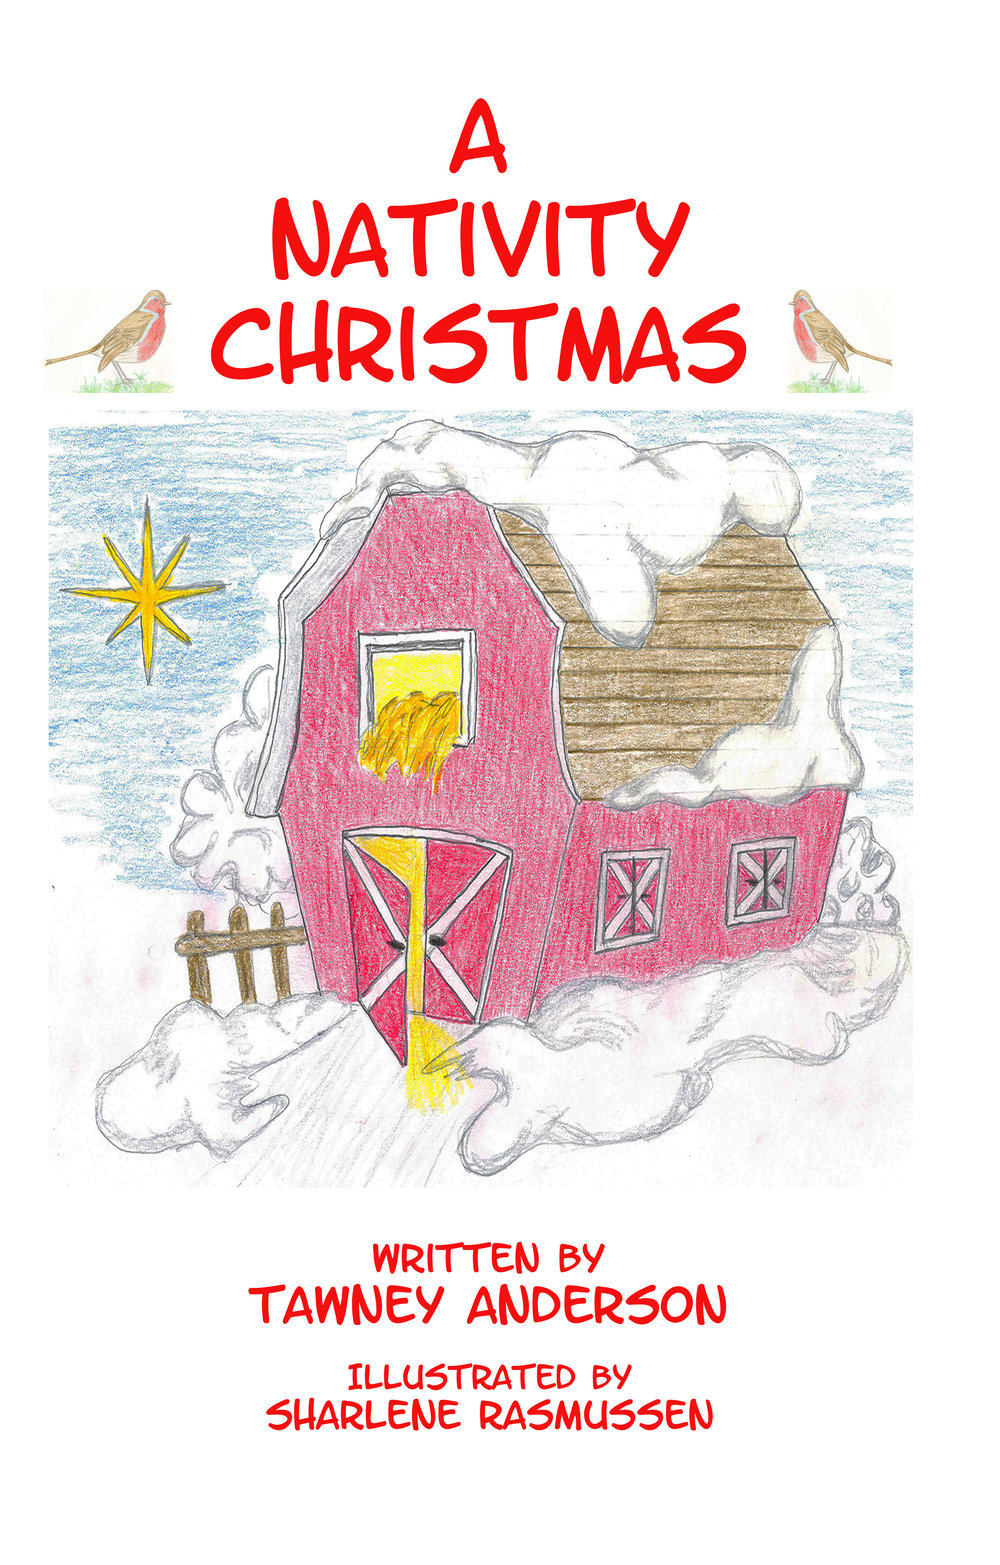 A_Nativity_Christmas_Cover_for_Kindle.jpg